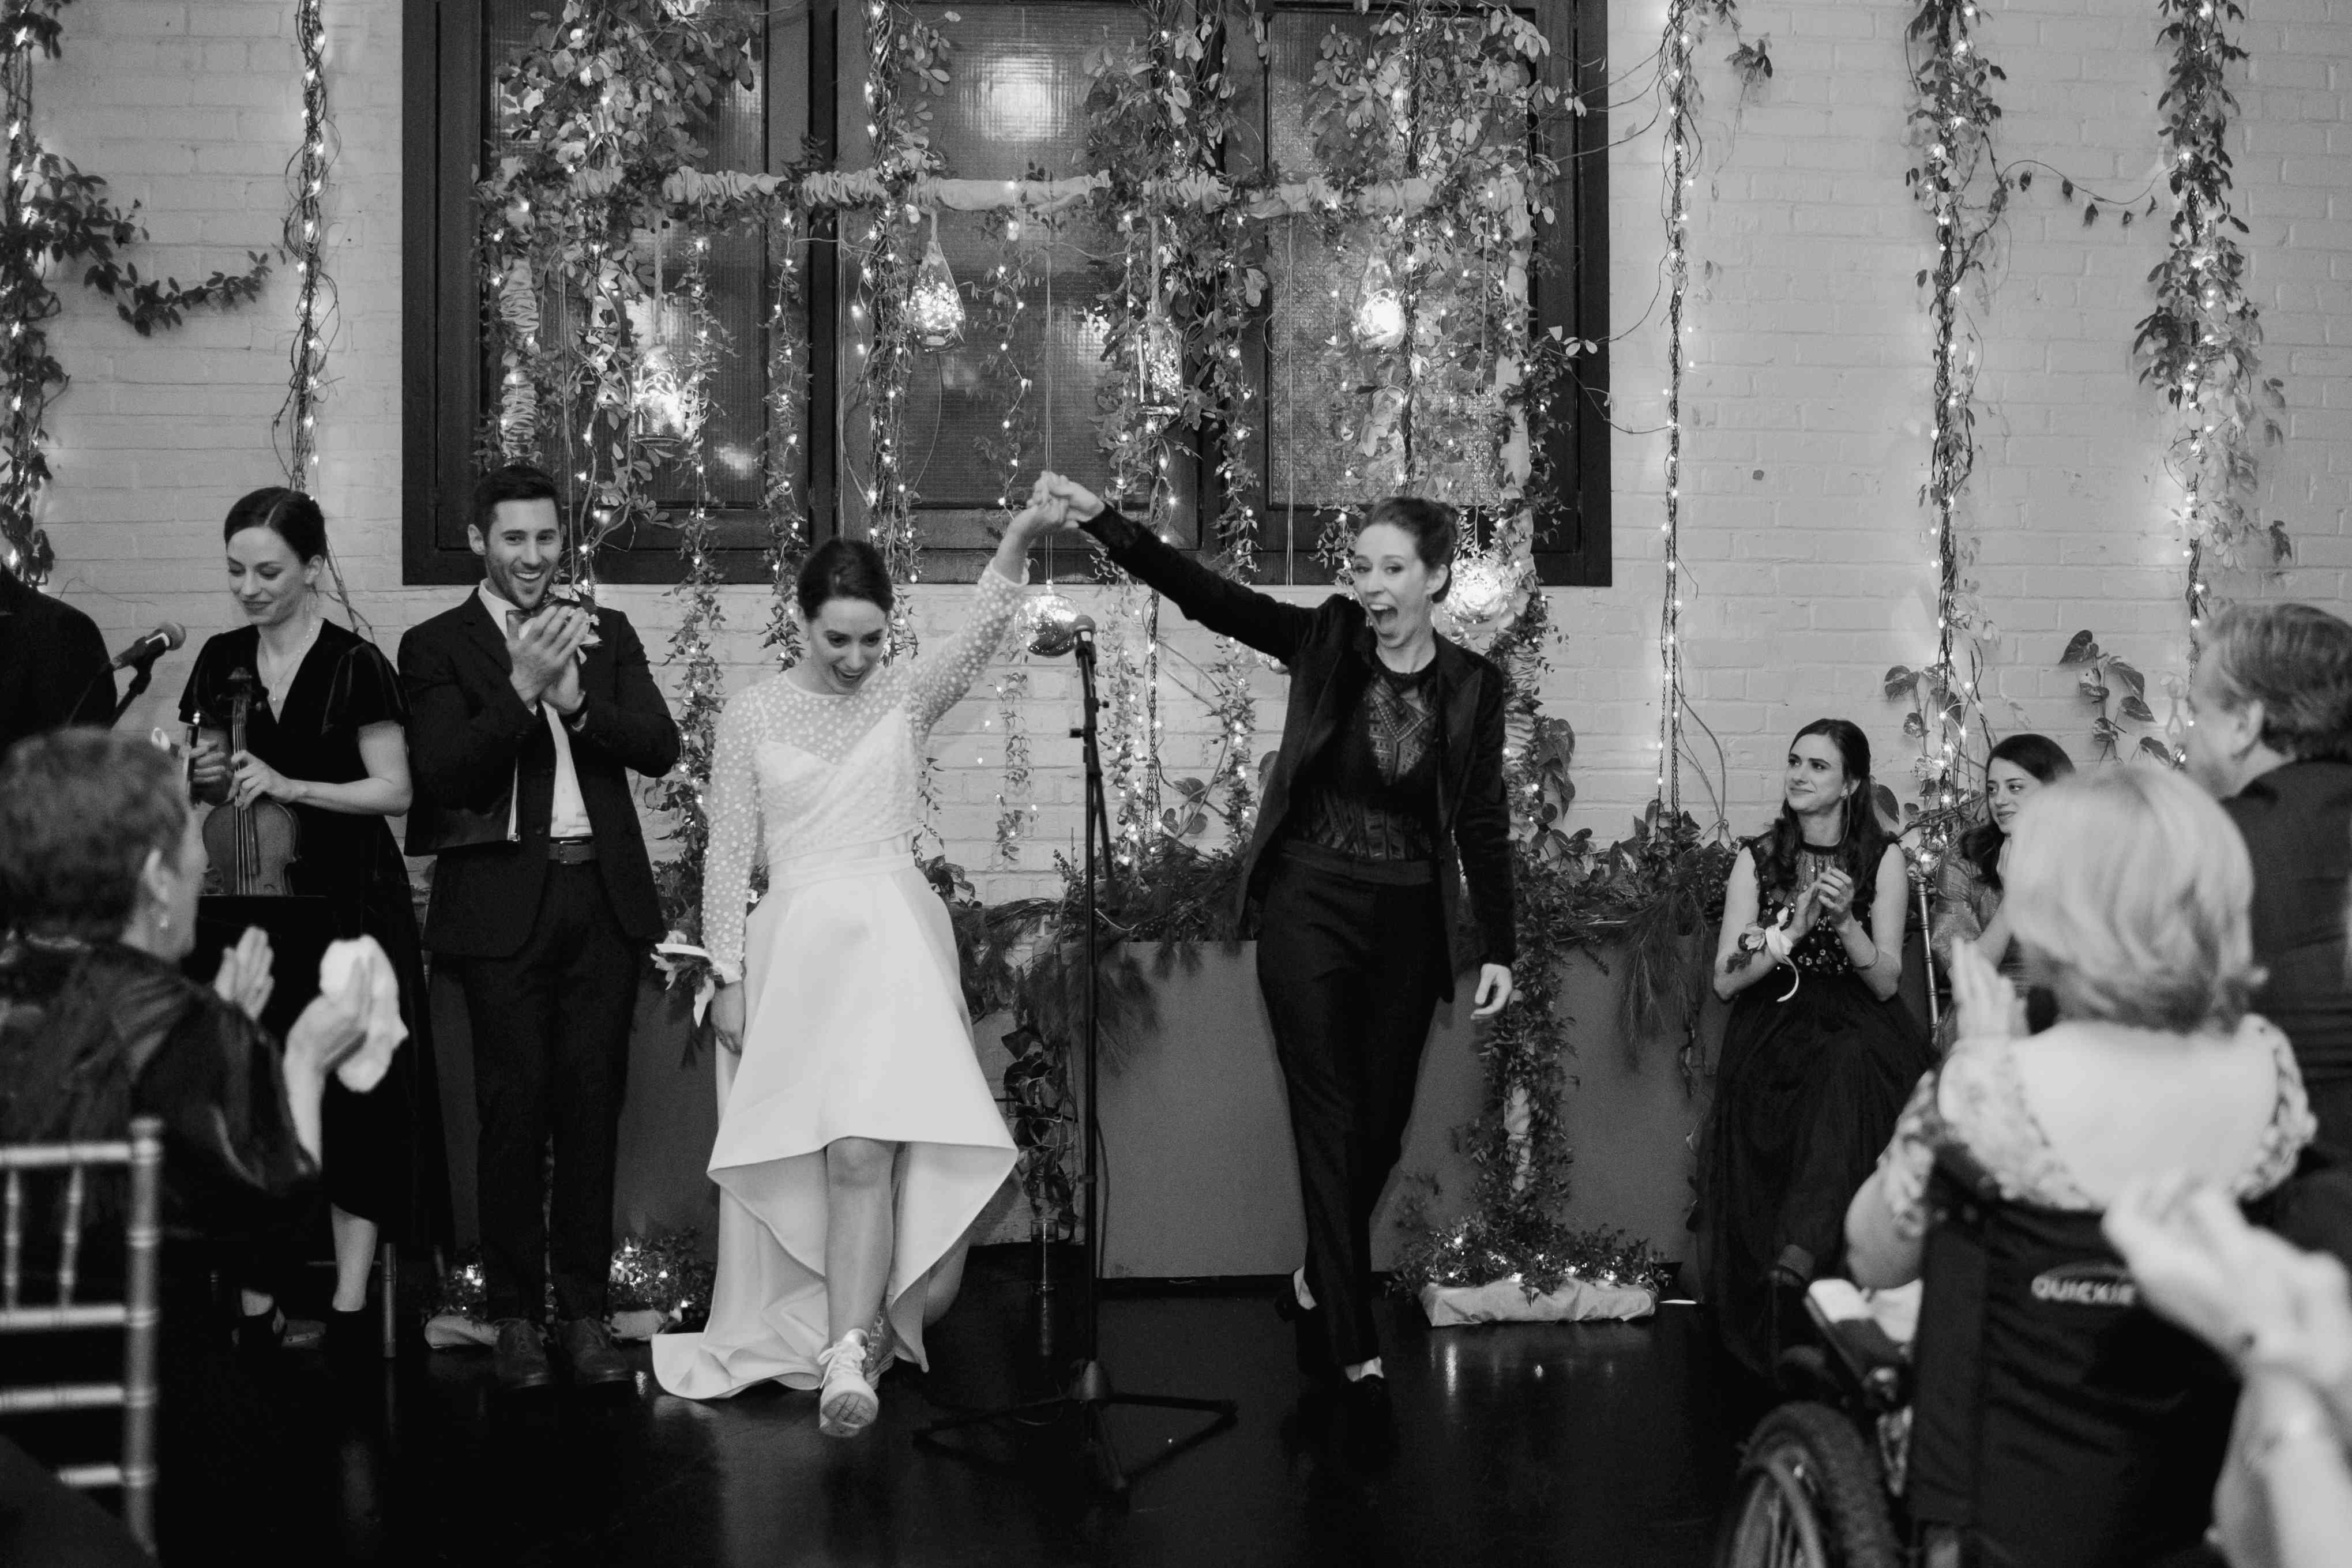 The brides recess down the aisle